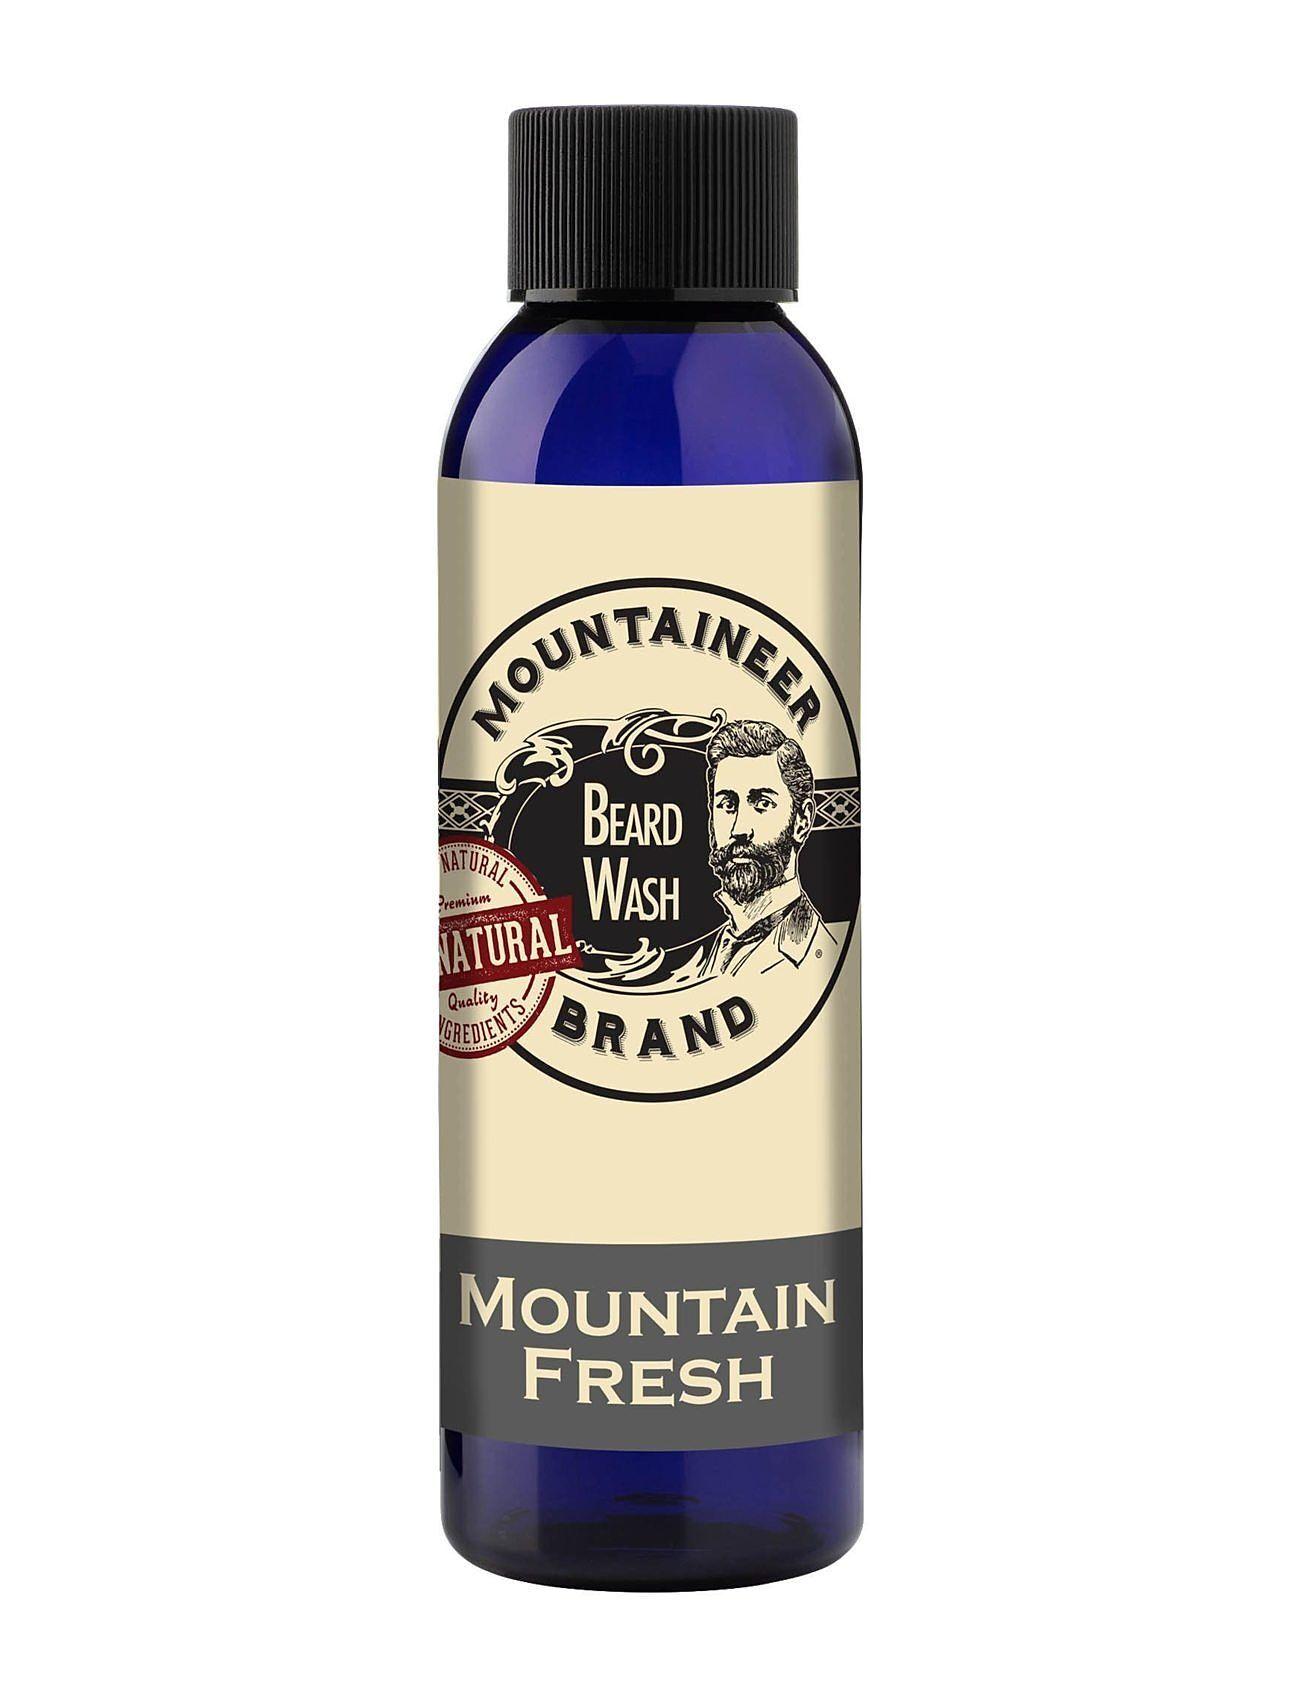 Mountaineer Brand Coal Beard Wash Beauty MEN Shaving Products Beard & Mustache Nude Mountaineer Brand